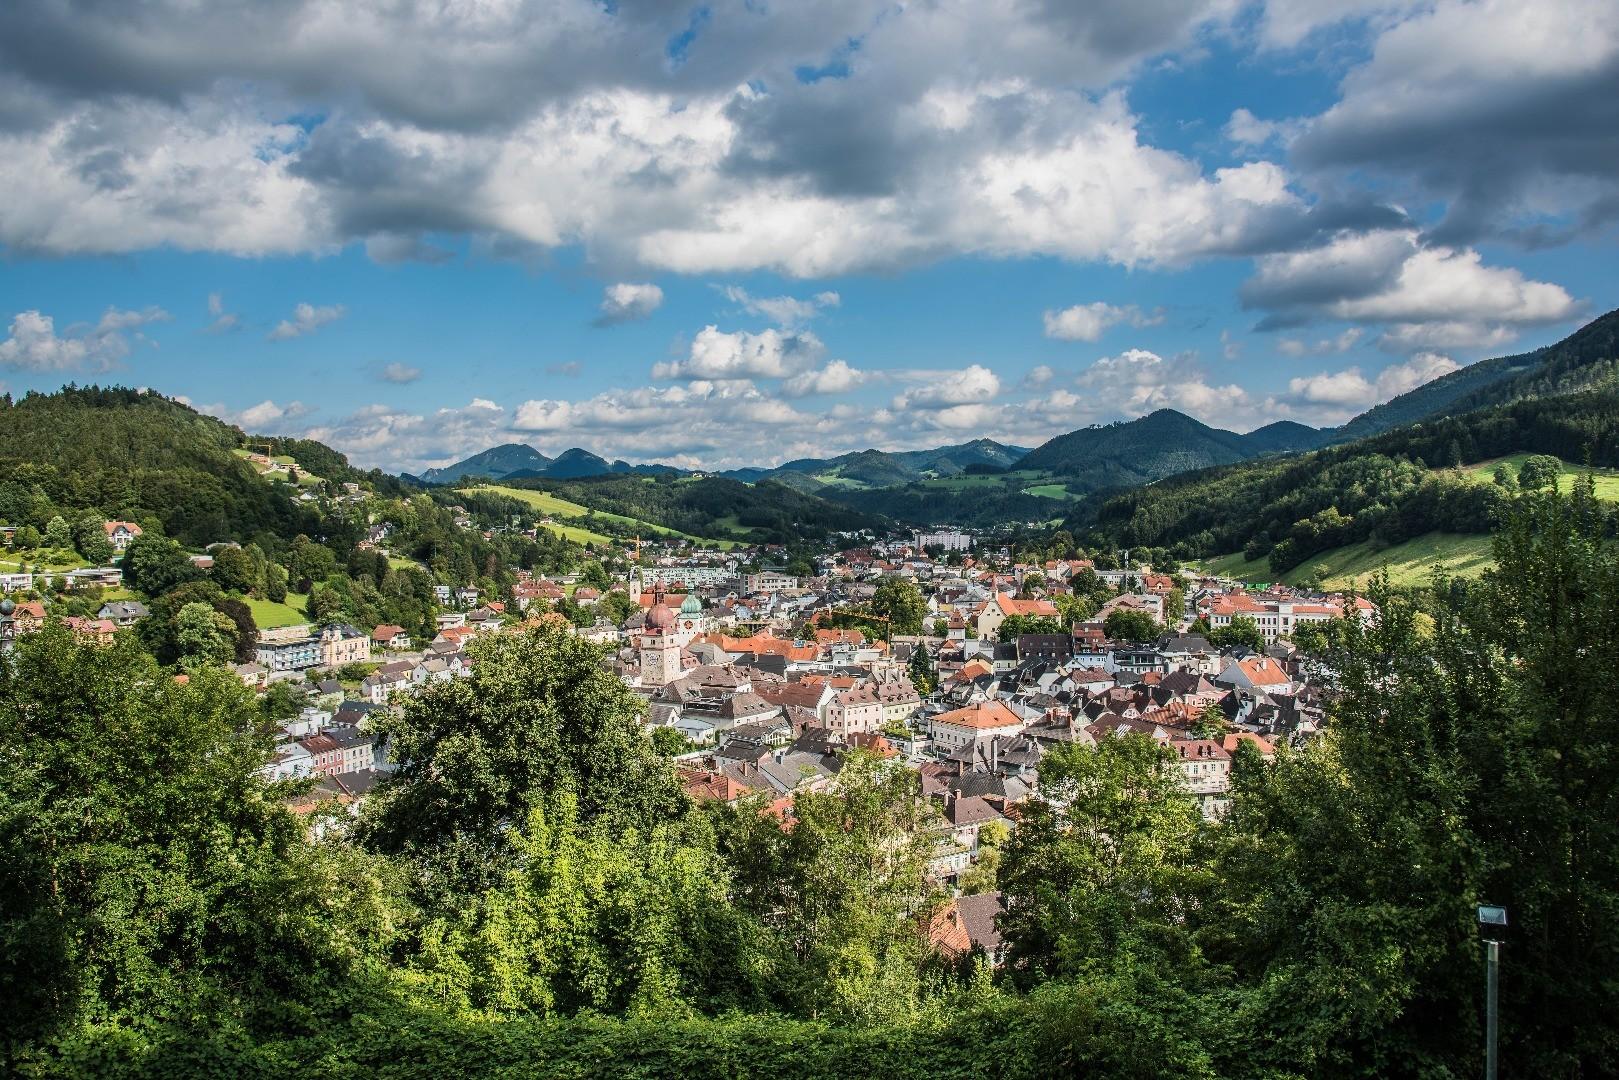 Stadt_Waidhofen_bewölkt.jpg